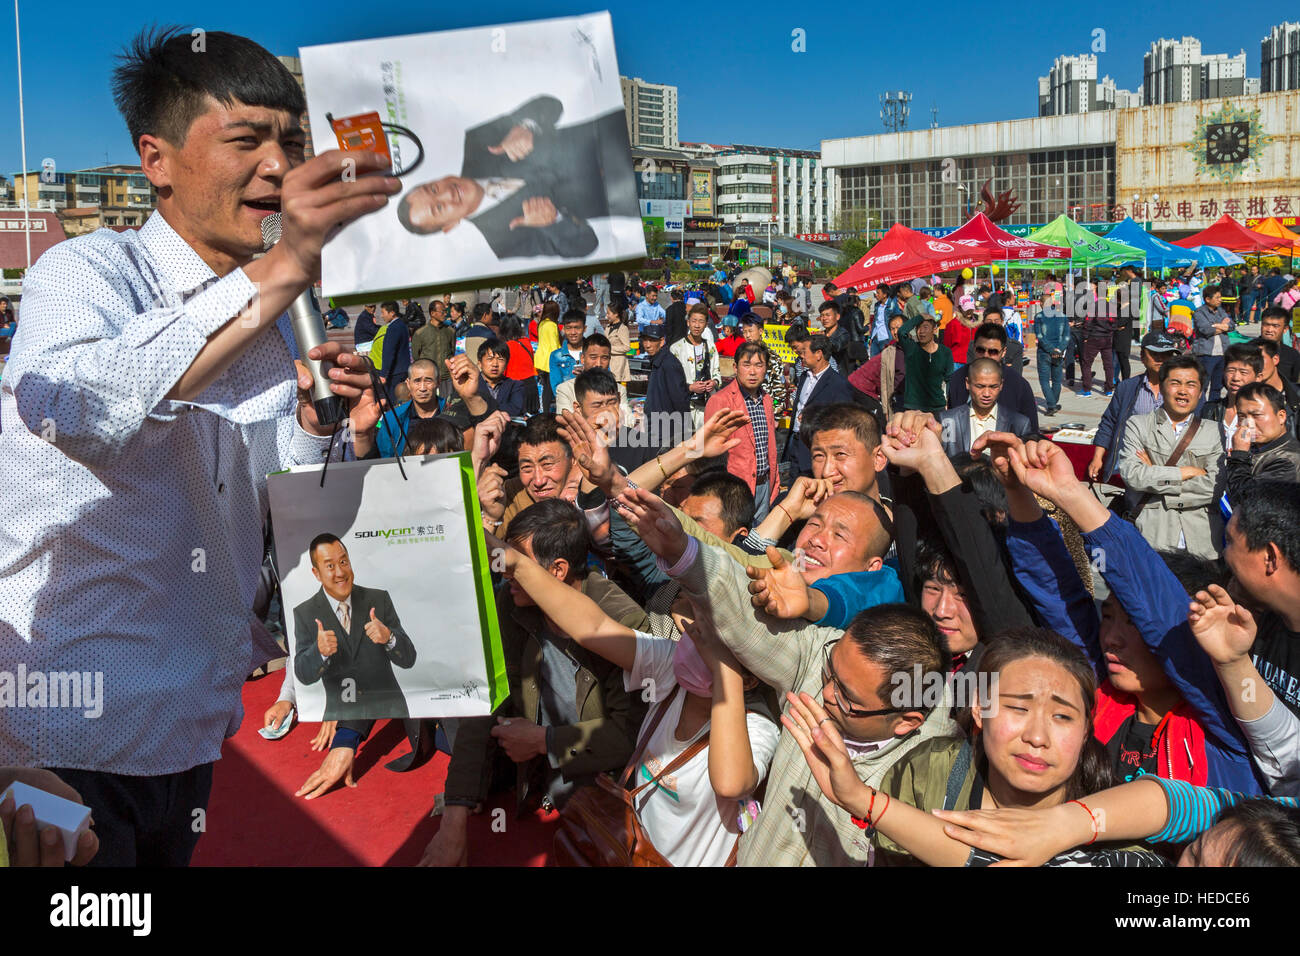 Chinese trader selling at public auction, Nanmen Square, Yinchuan, Ningxia, China Stock Photo